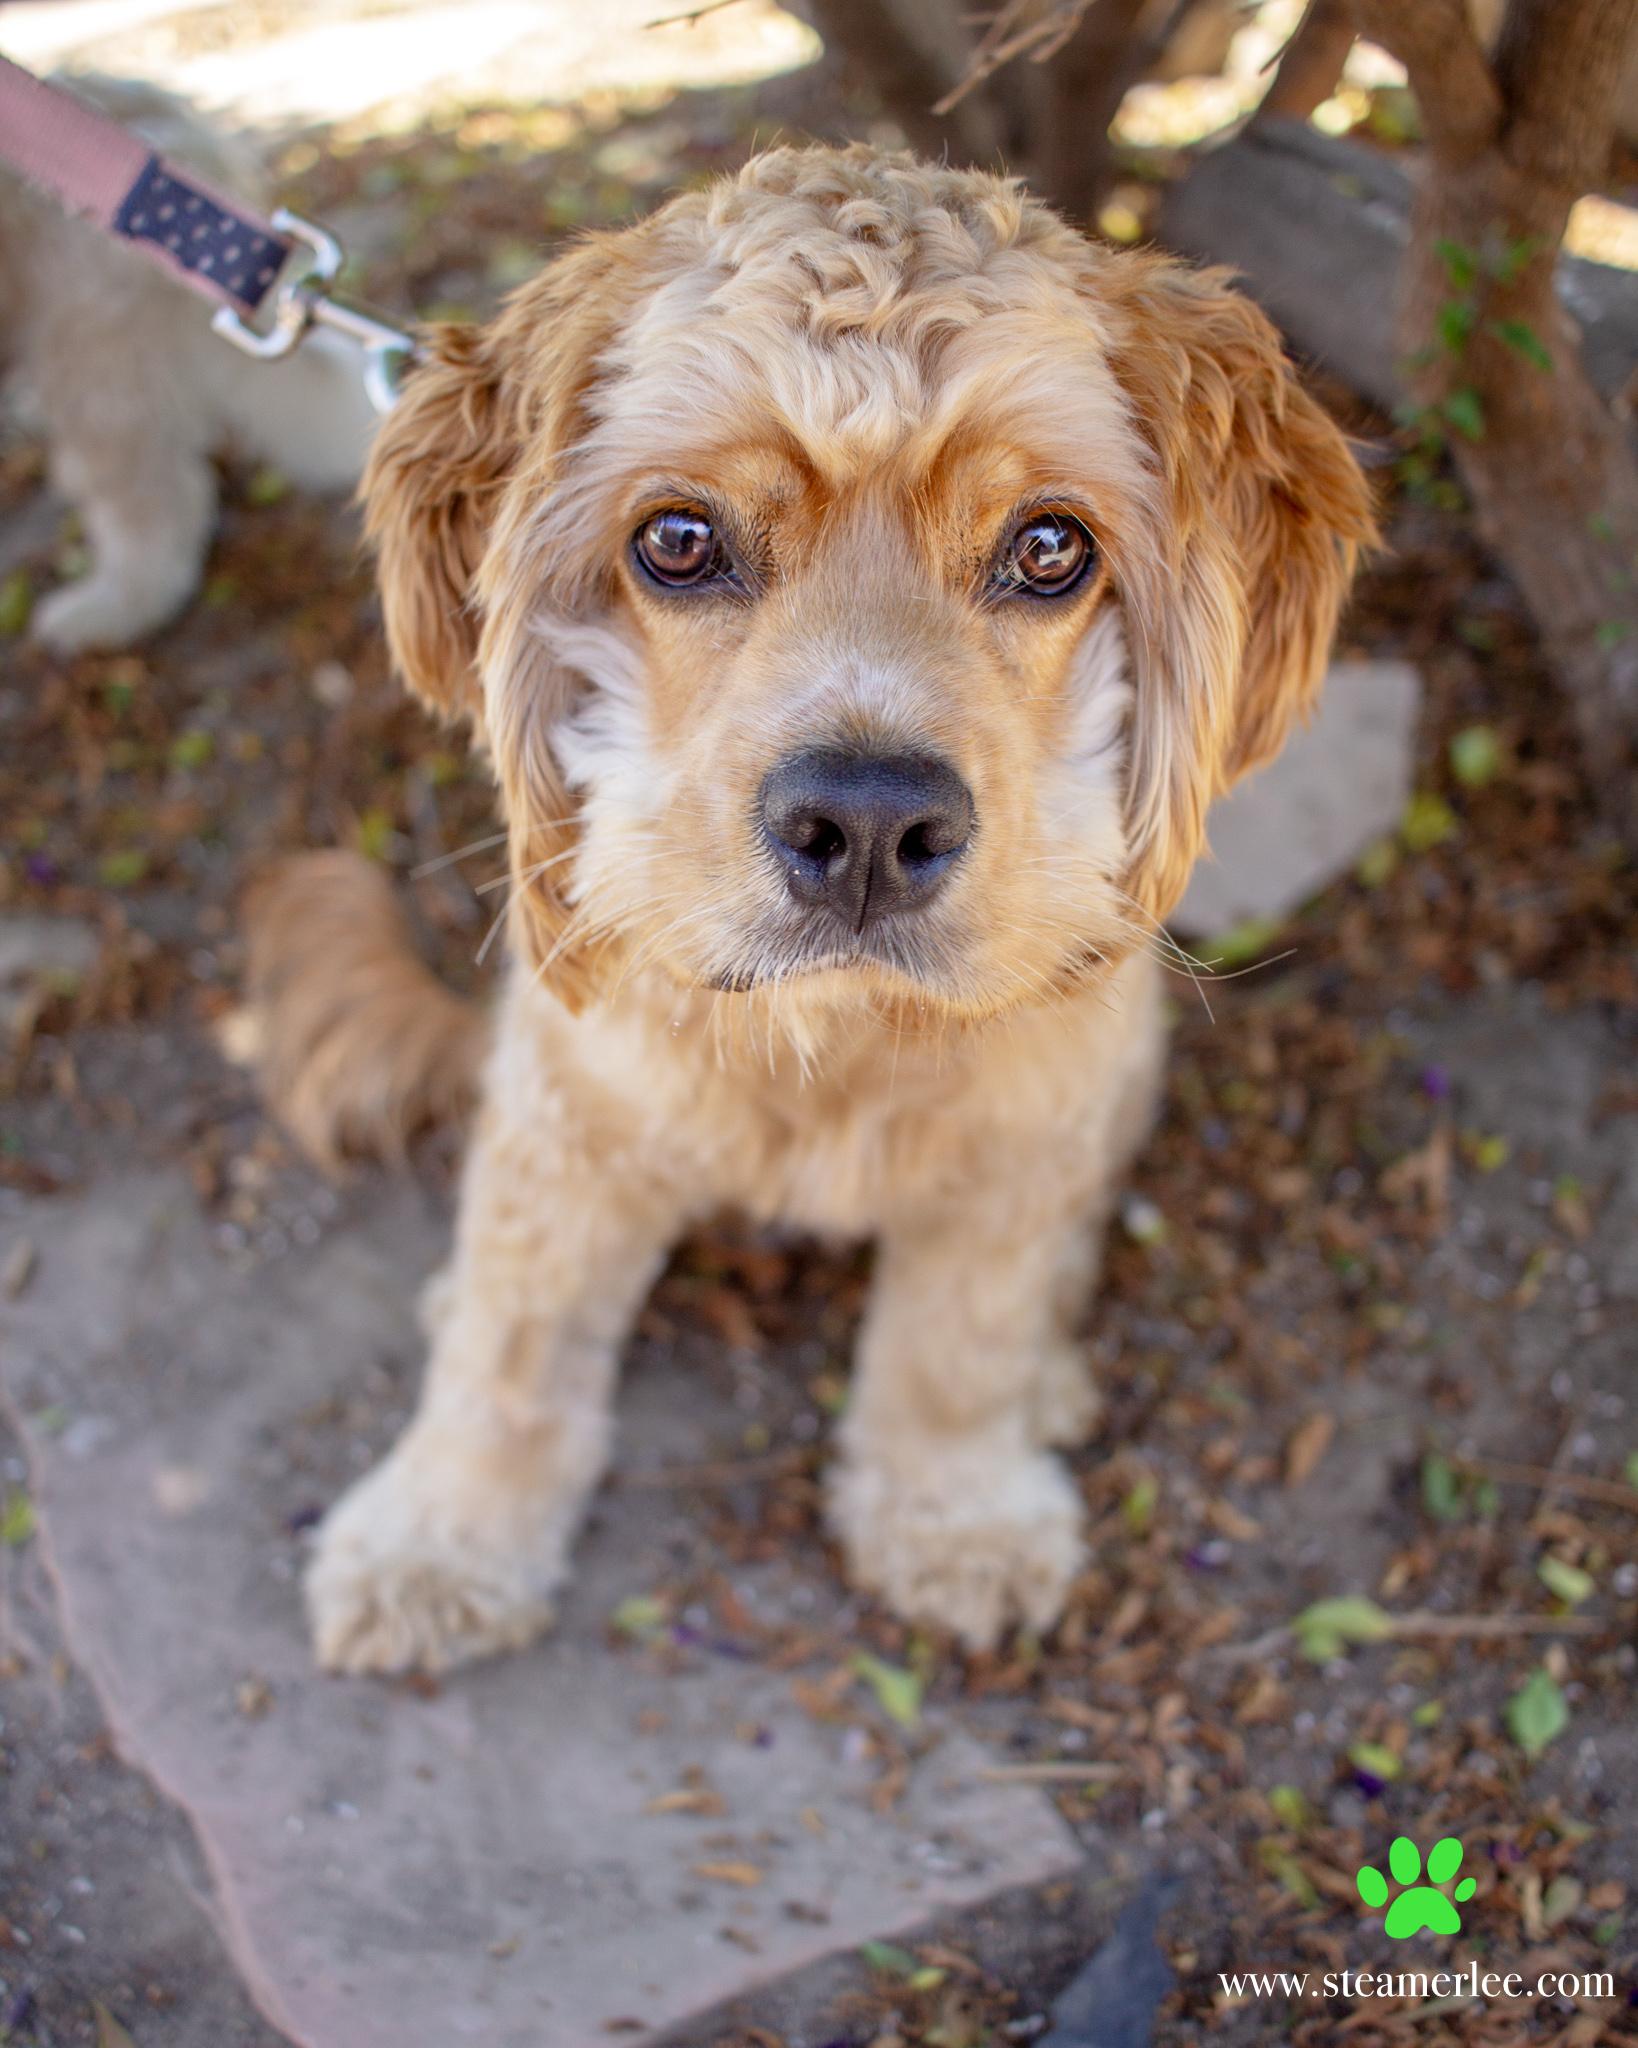 503-Orange-County-Dog-Photography-Steamer-Lee-Southern-California-SBACC.JPG